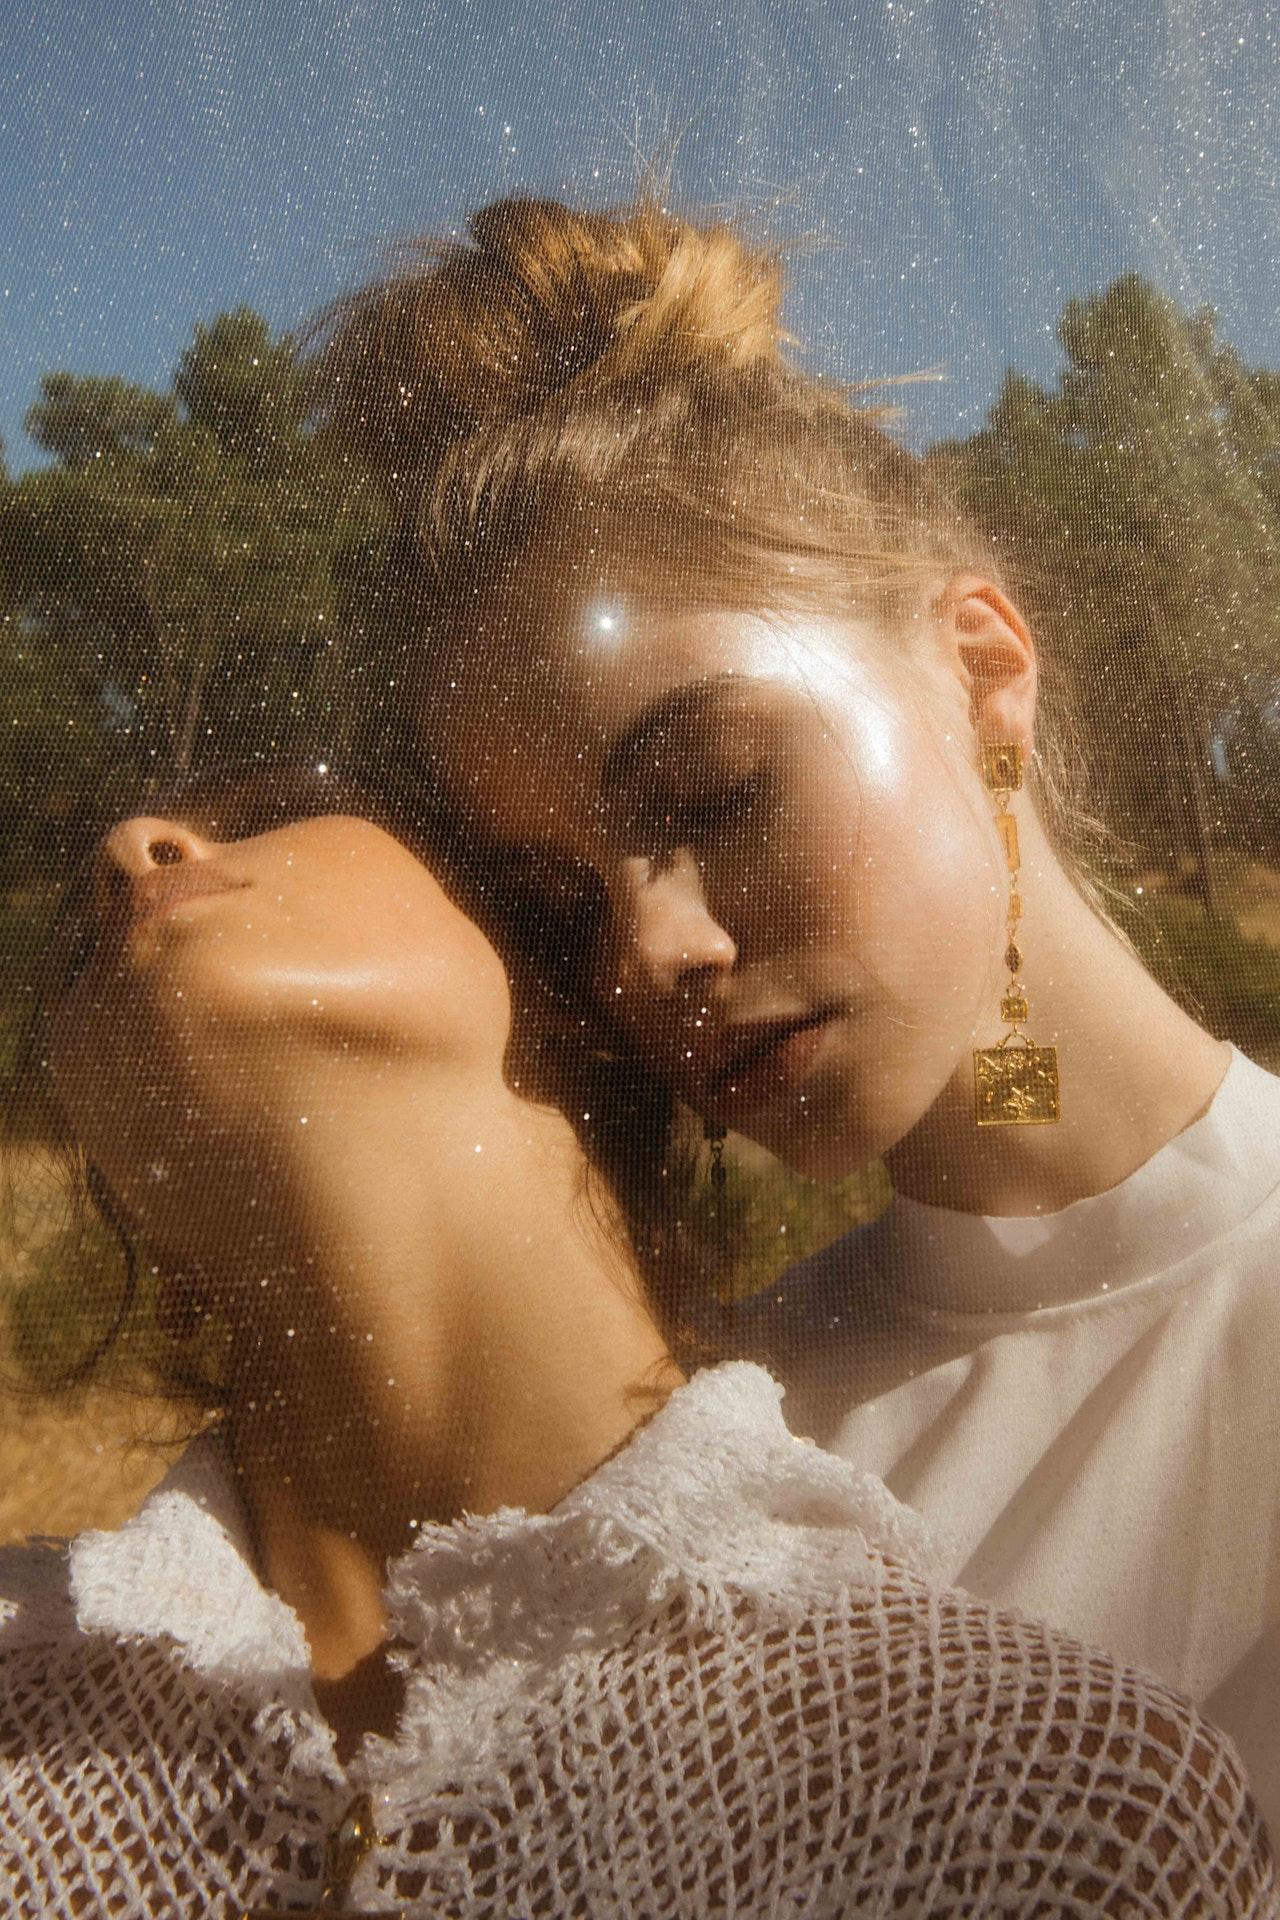 'GOLDEN GIRLS' - MEOW MAG